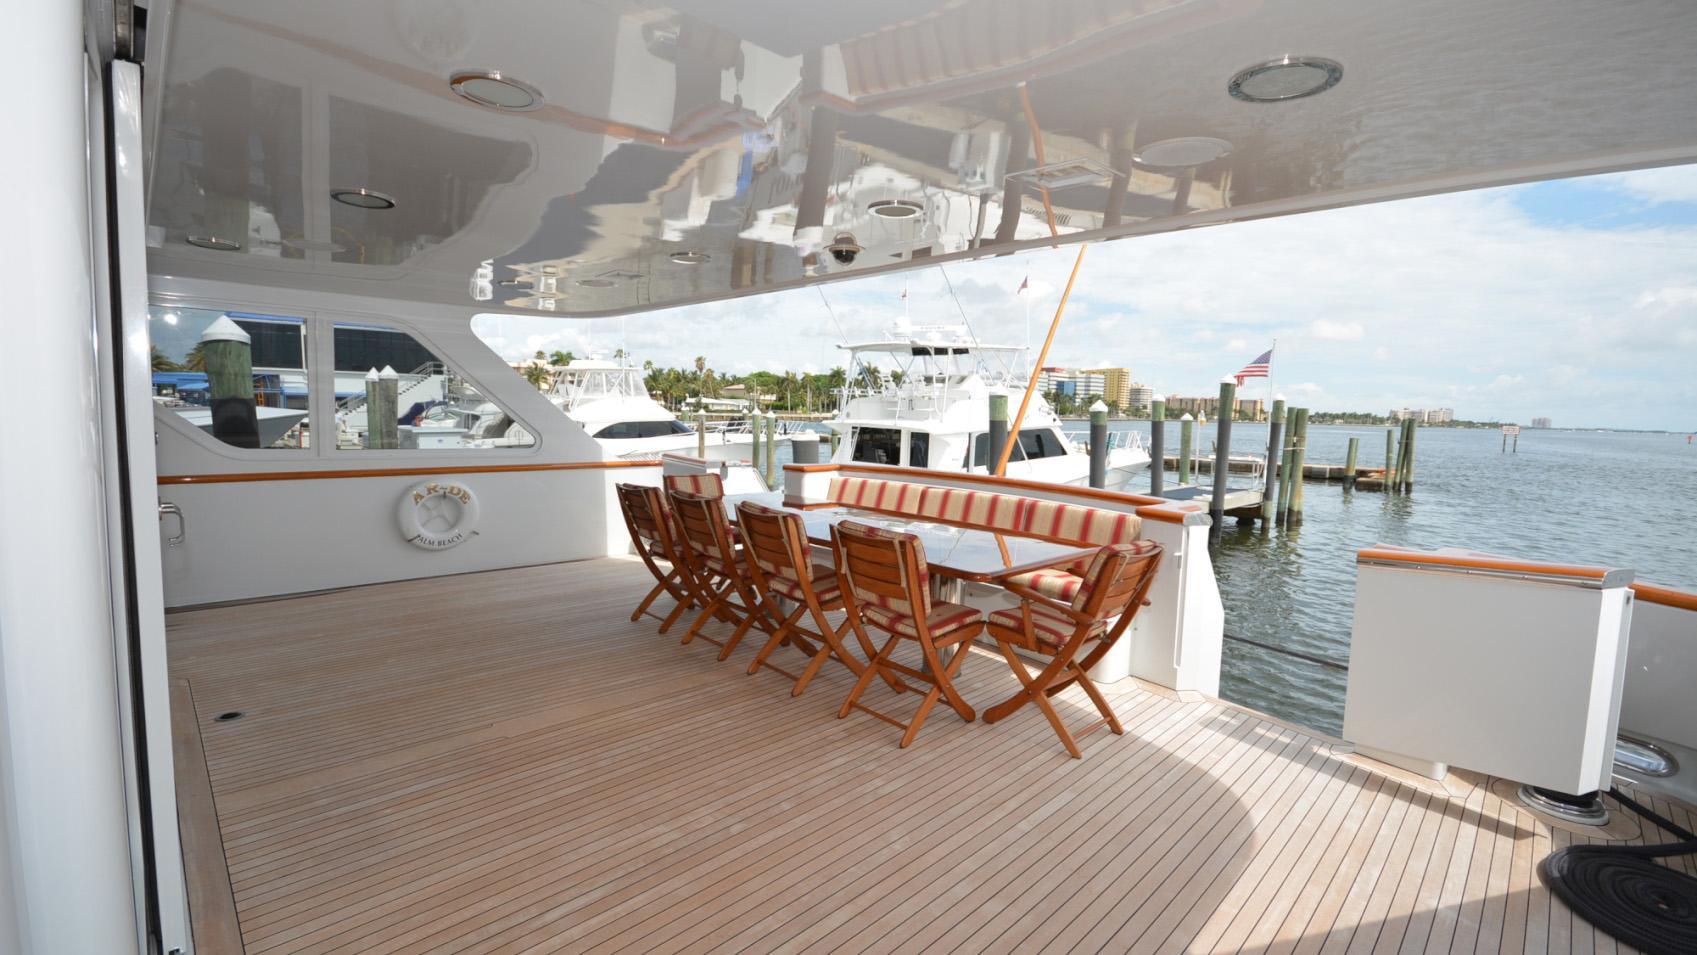 Ar De motor yacht for sale aft deck